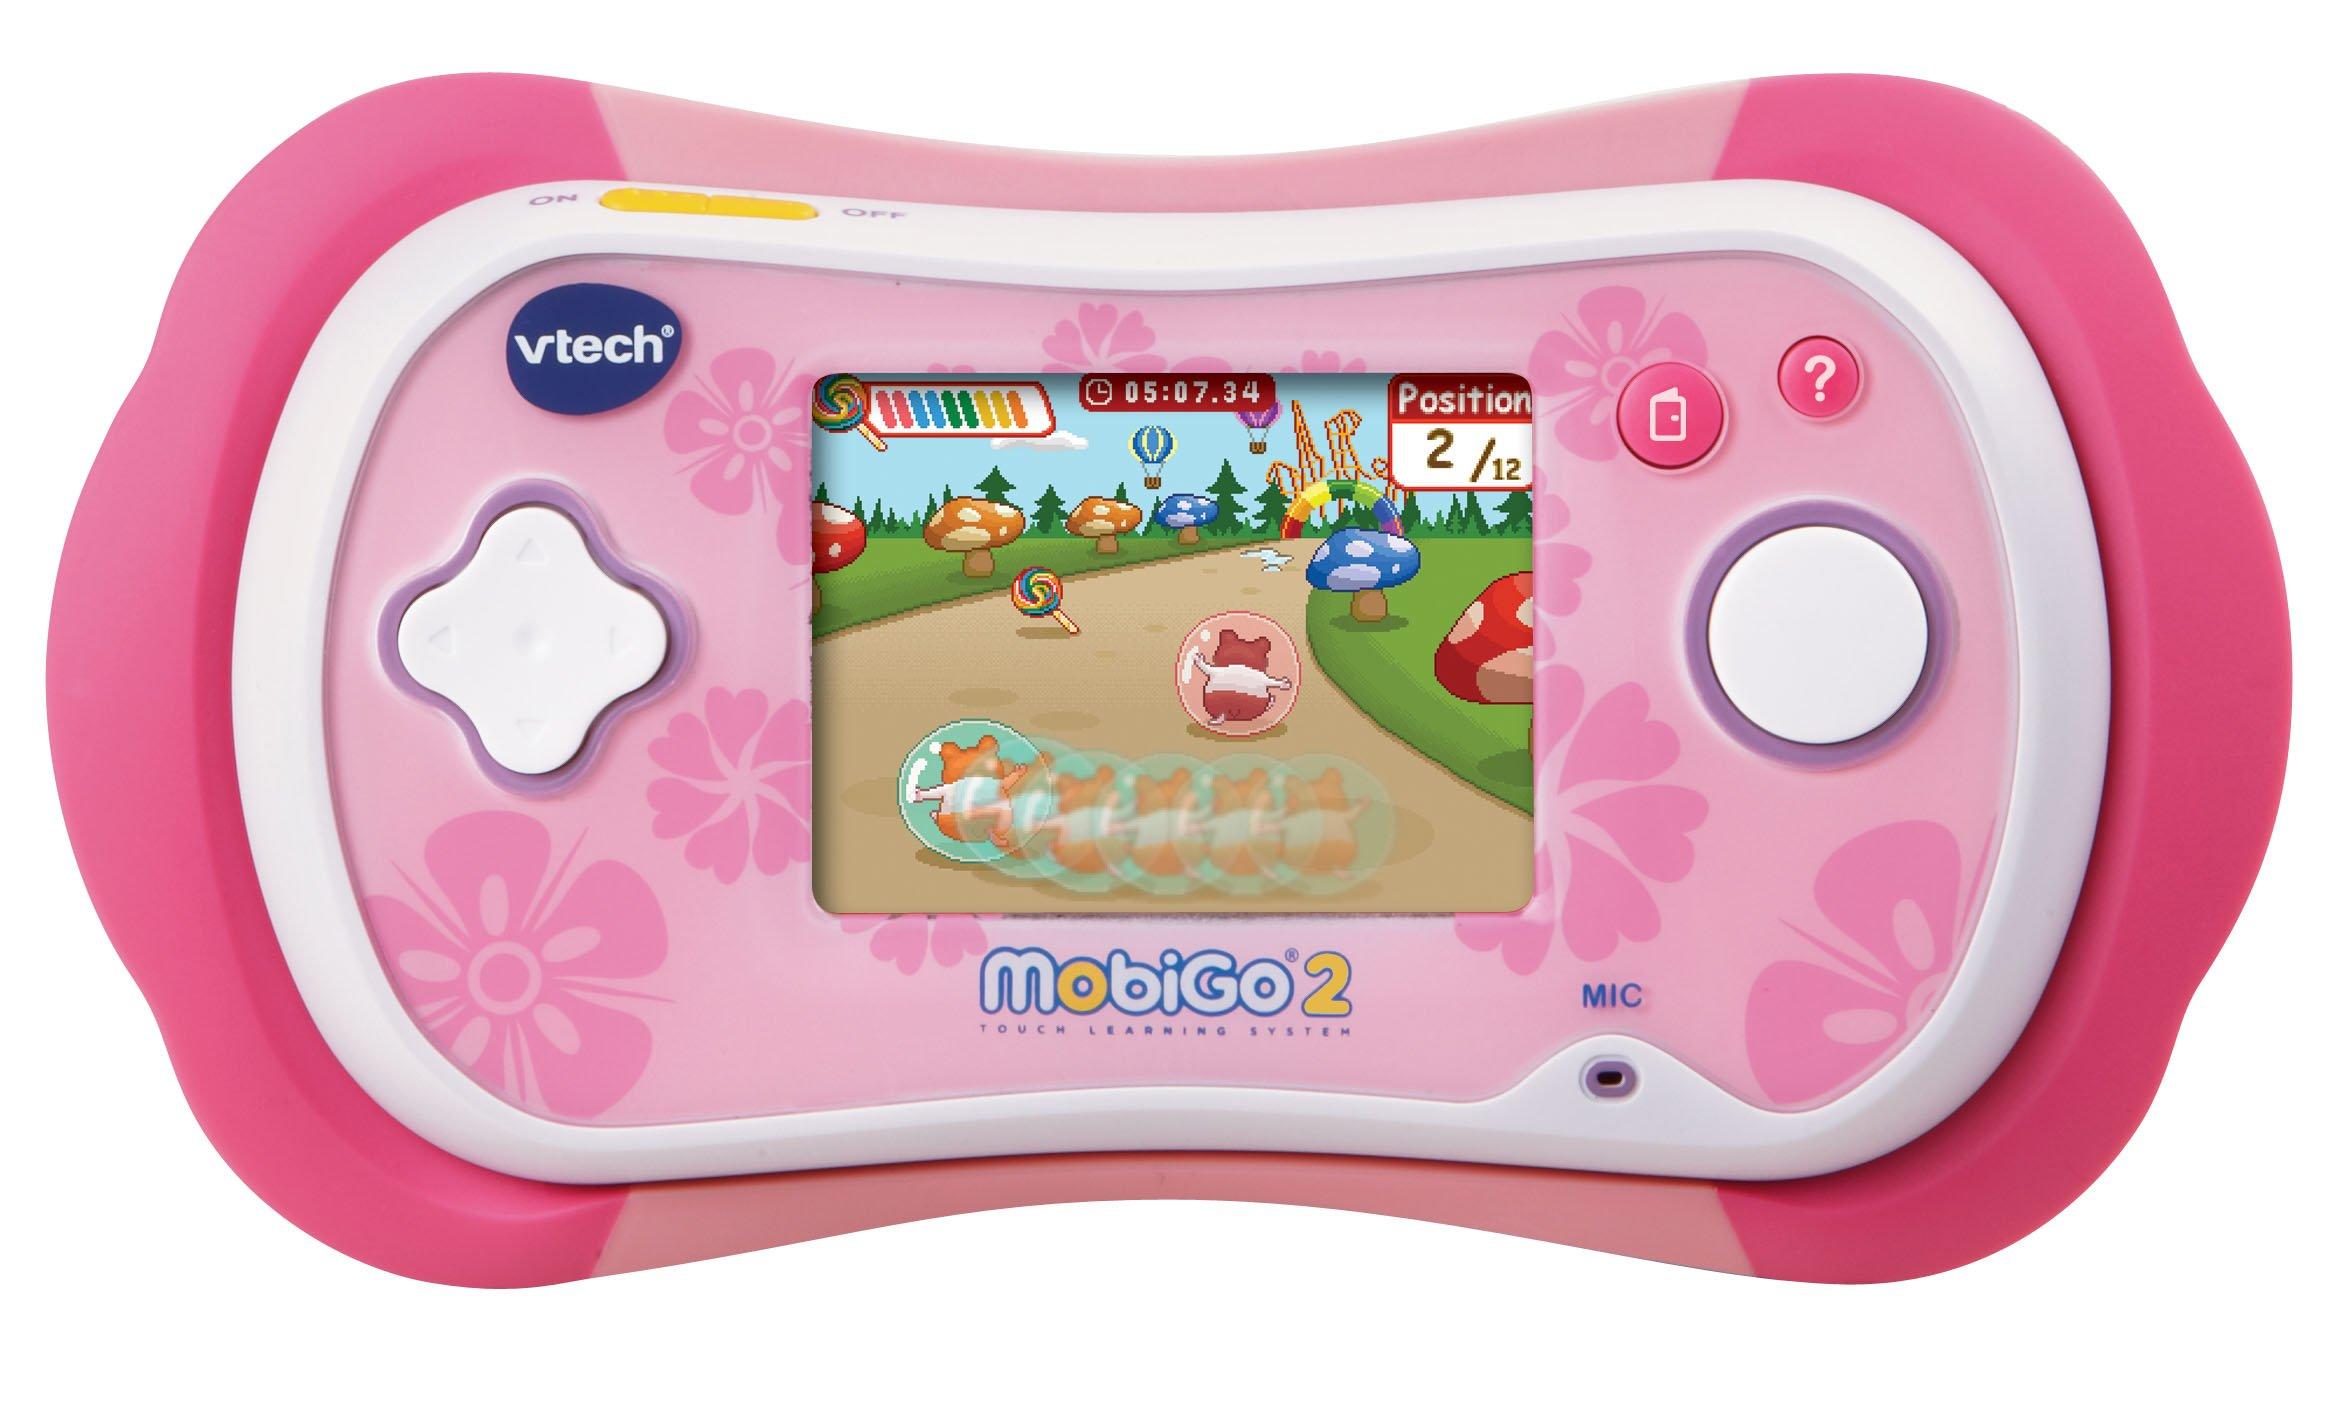 VTech MobiGo 2 Touch Learning System - Pink by VTech (Image #4)